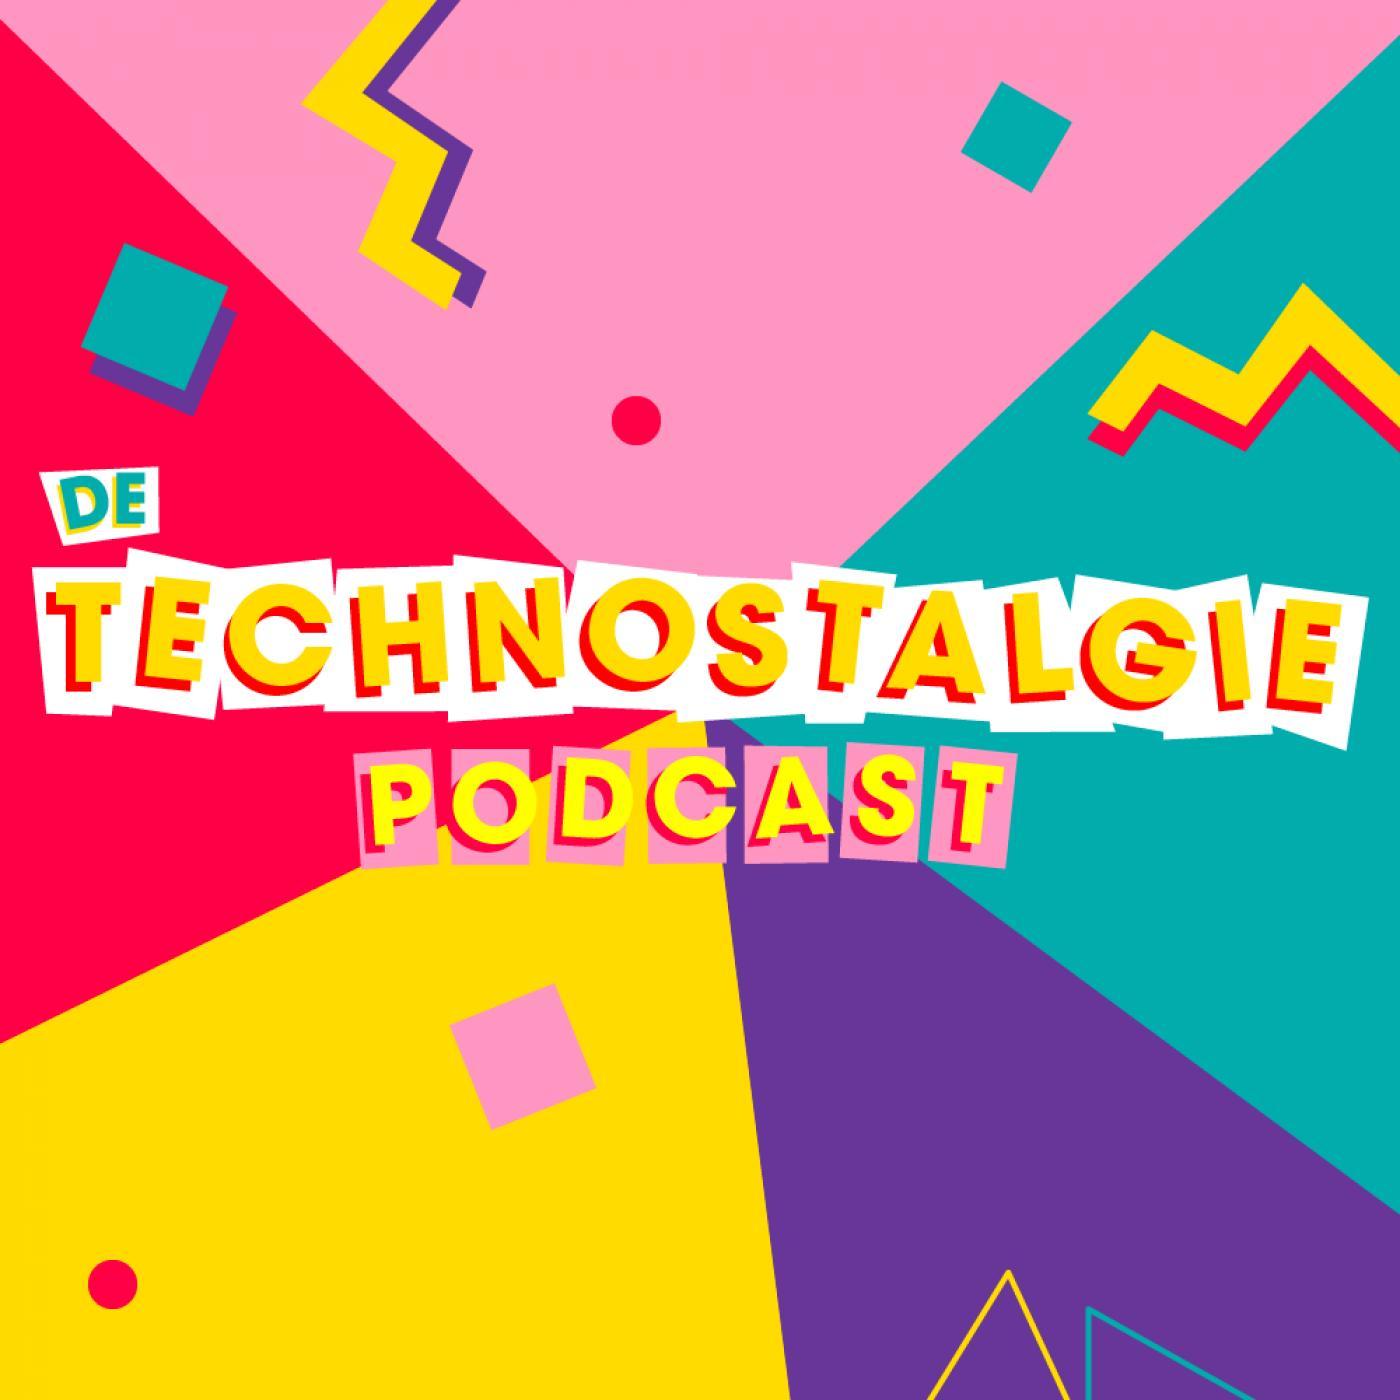 De Technostalgie Podcast logo